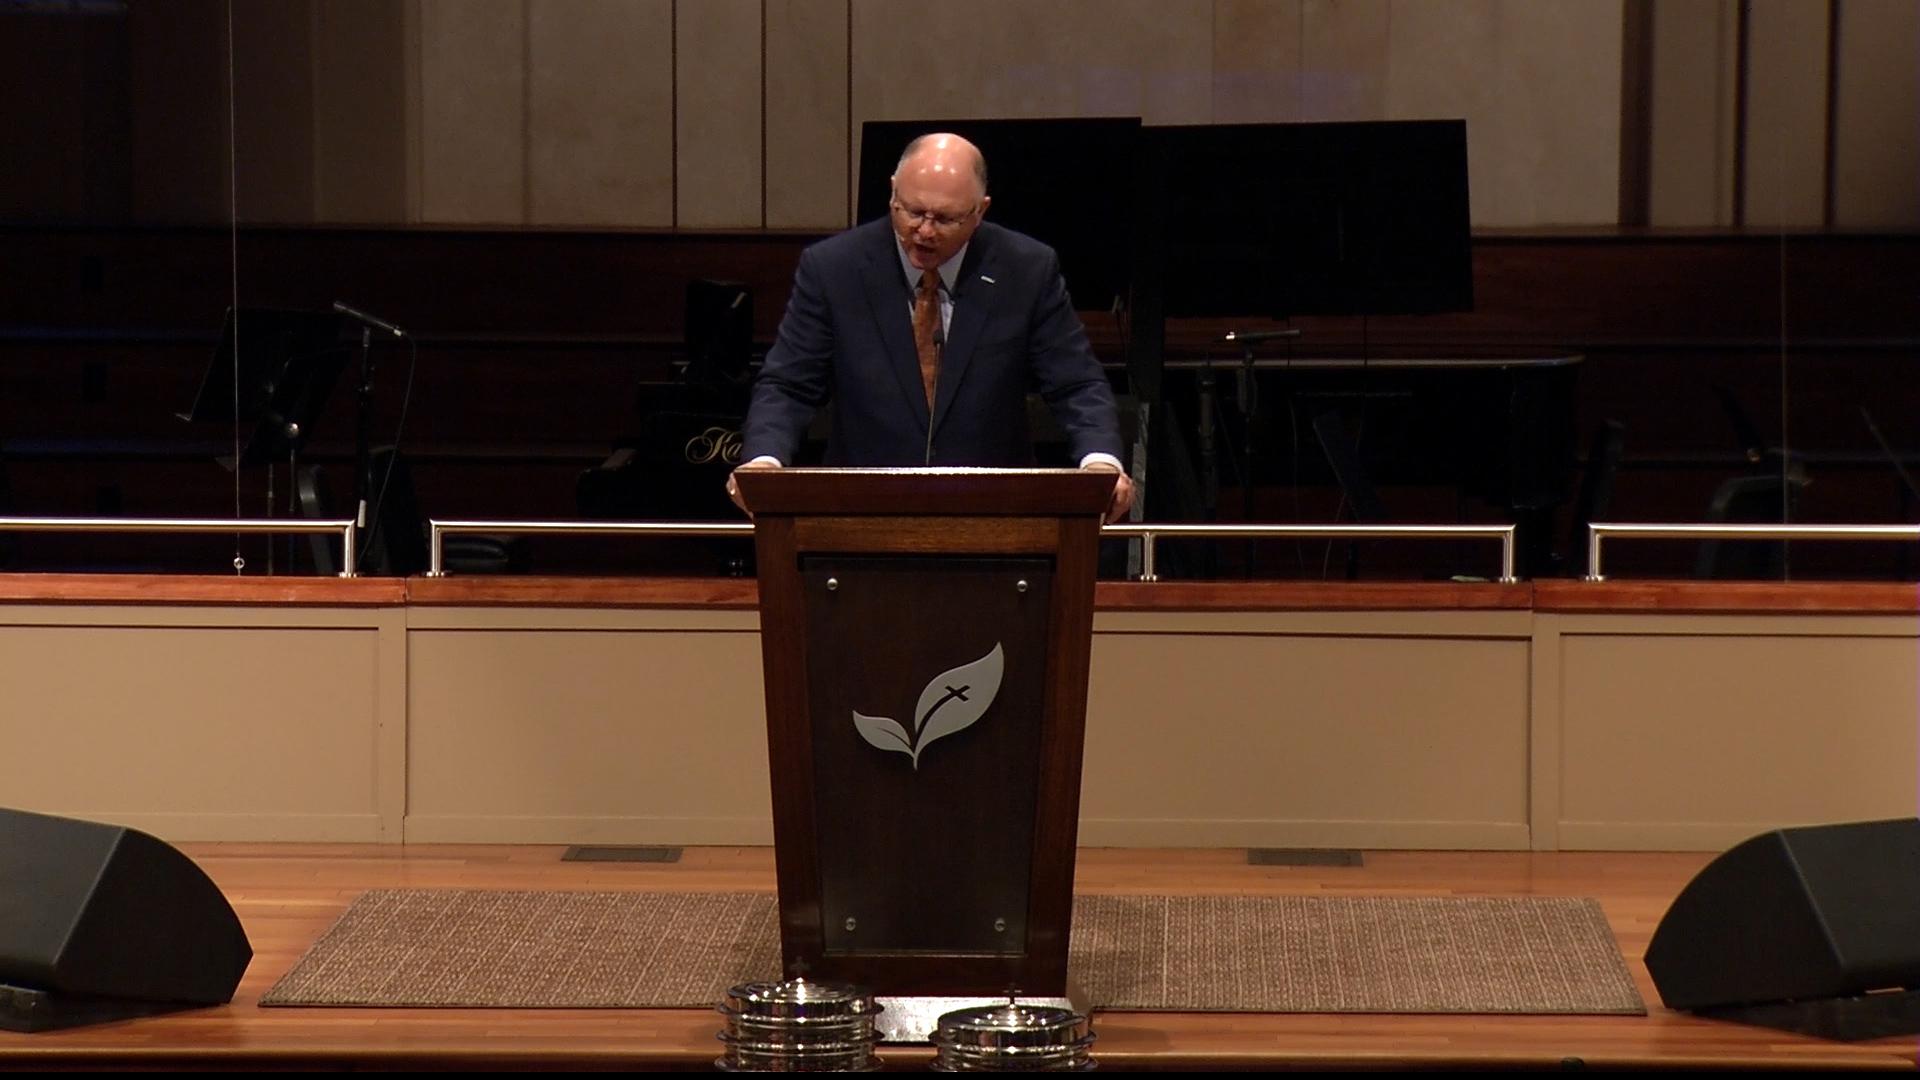 Pastor Paul Chappell: In Christ